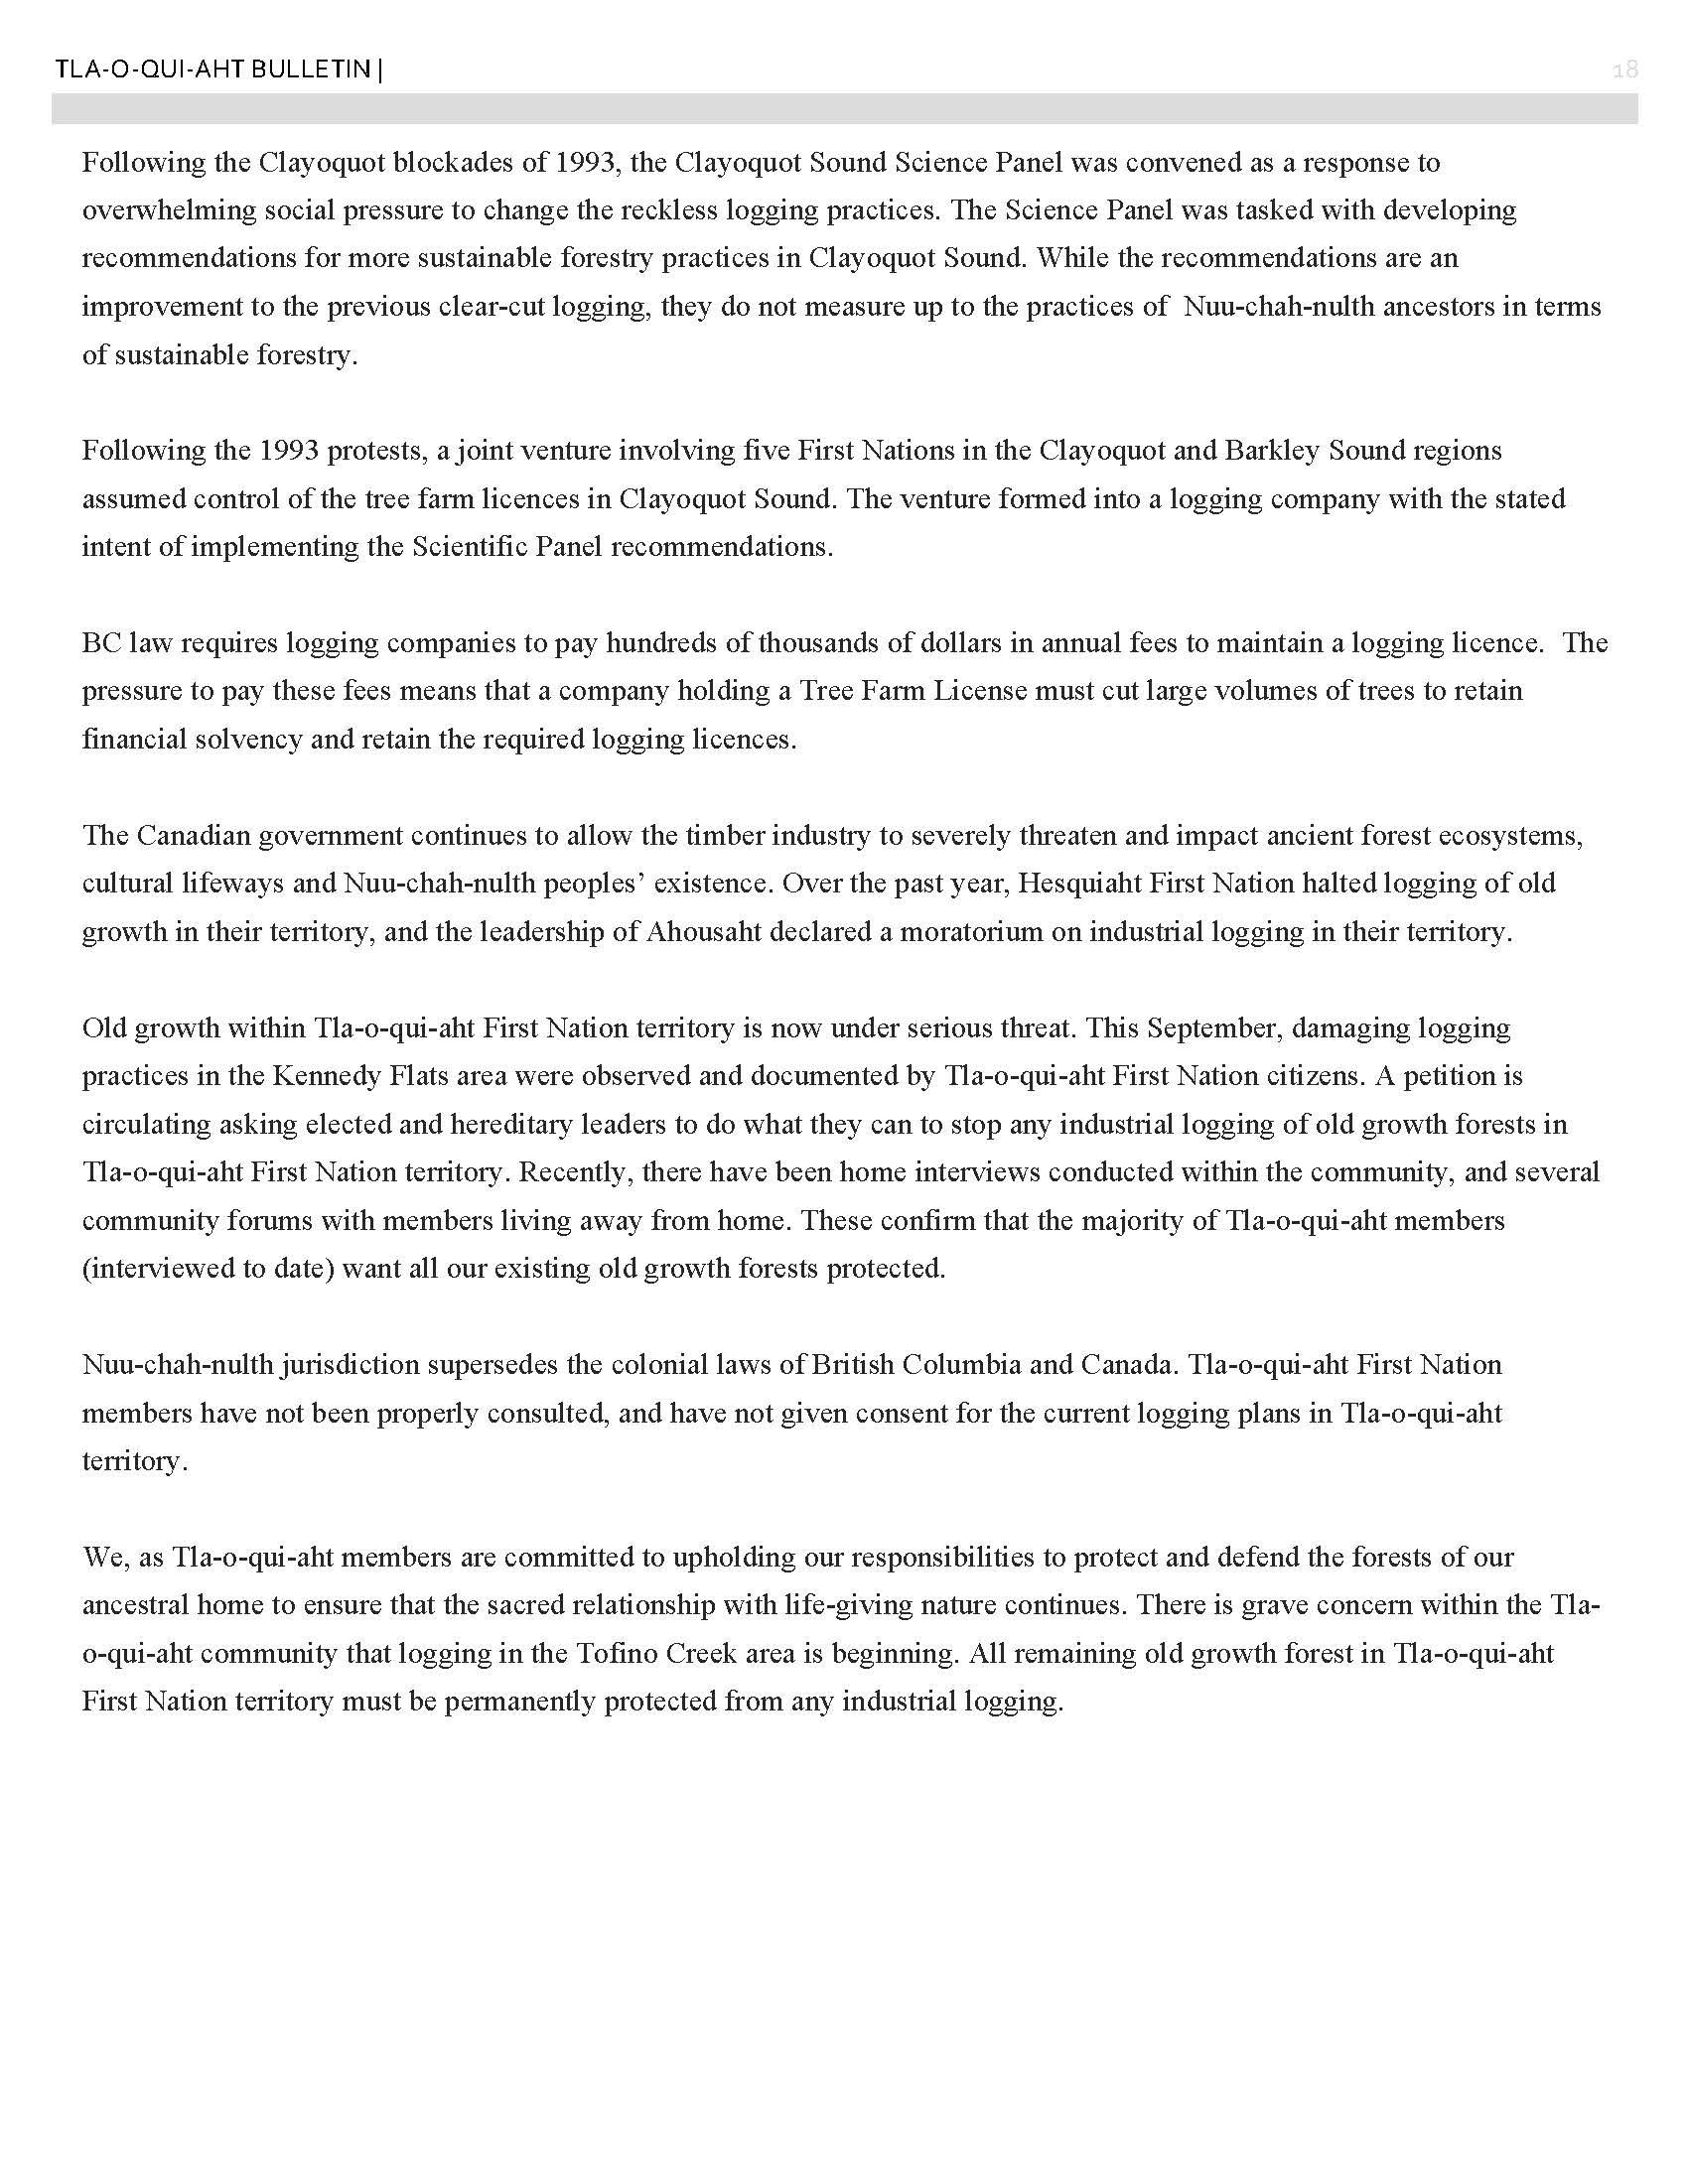 0TFN Bulletin Nov 15-2016_Page_18.jpg